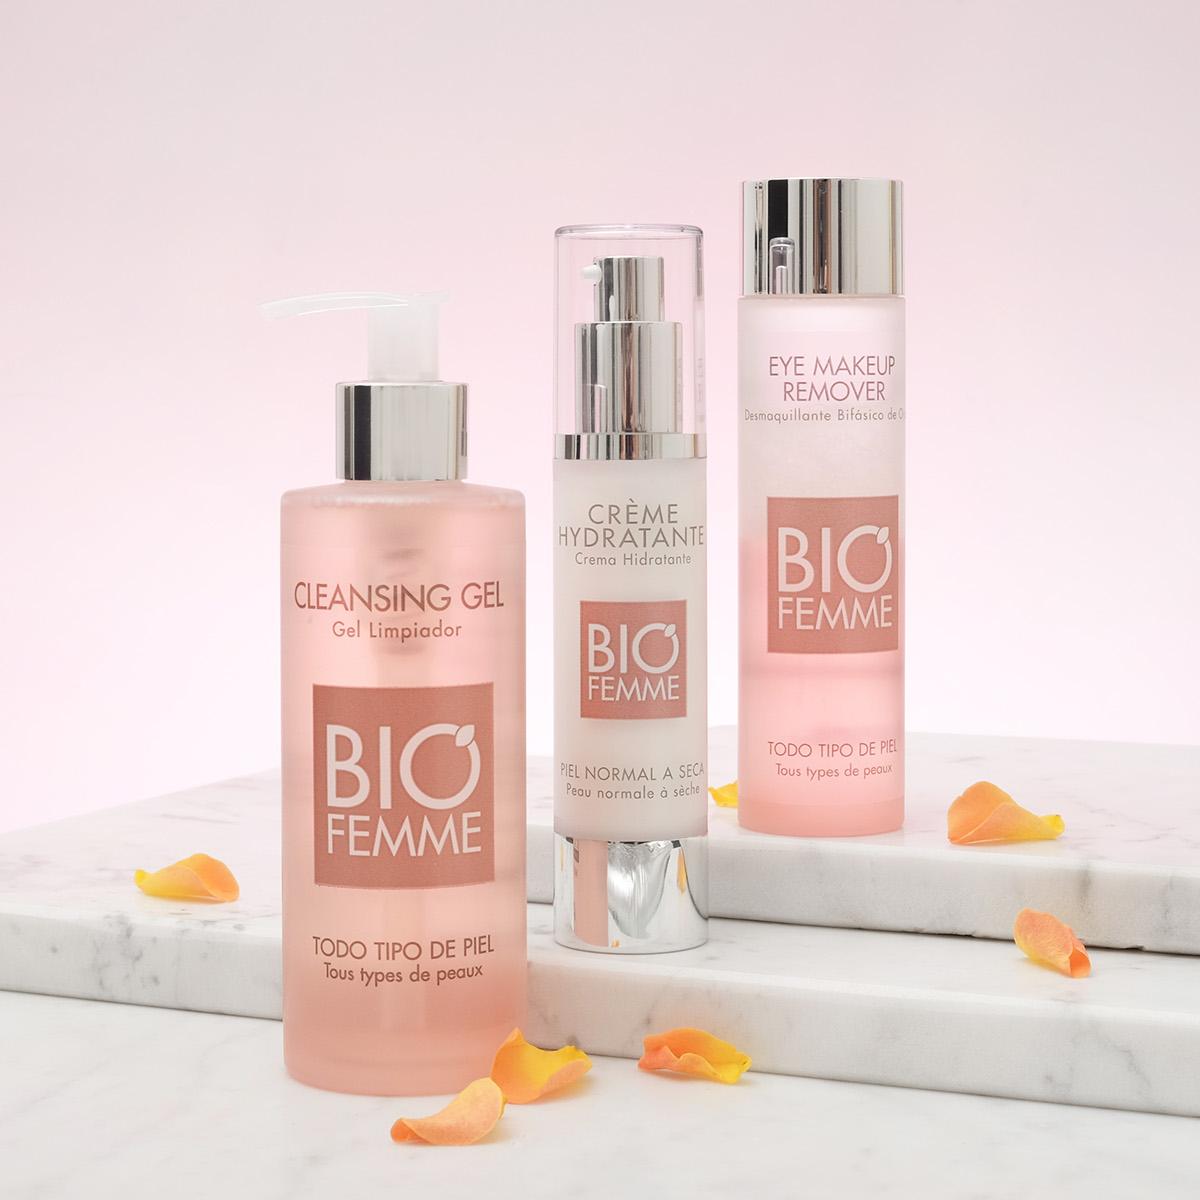 creme dermocleanser skincare beautycream beauty Ecuadorian Brand crema belleza cresens biofemme